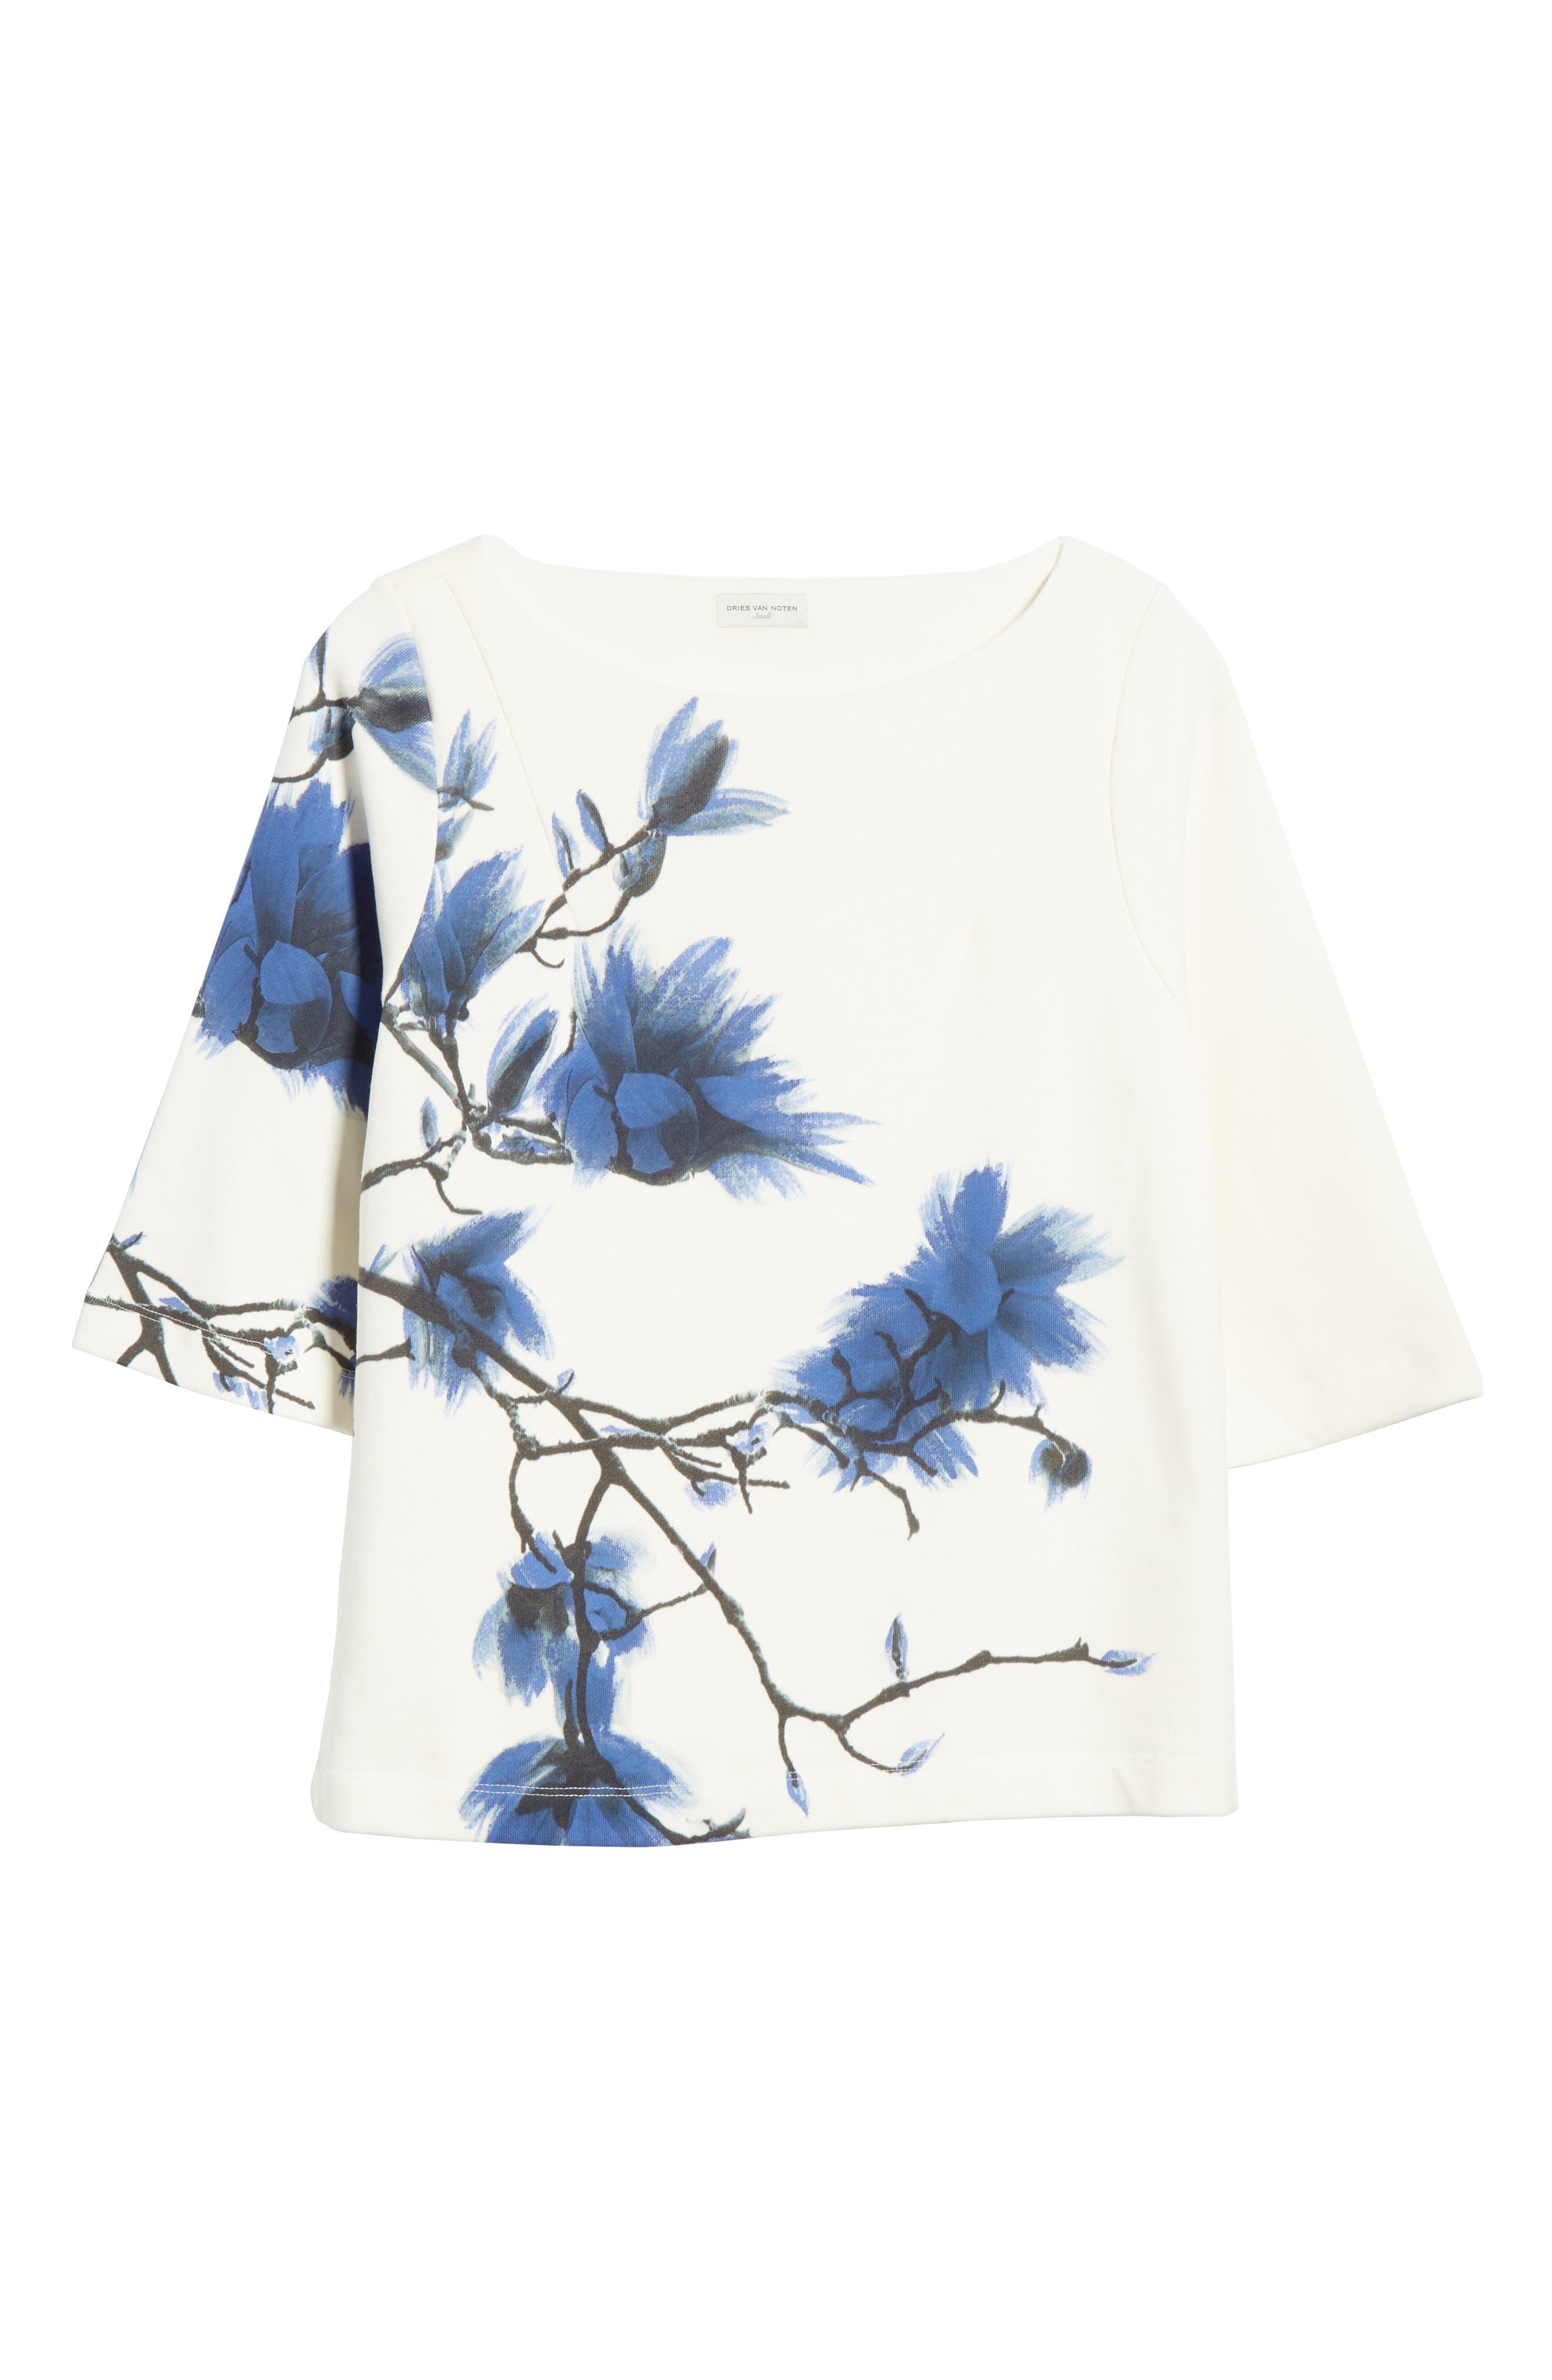 DRIES VAN NOTEN, Haendel Hand Painted Floral Top, Alternate thumbnail 6, color, BLACK